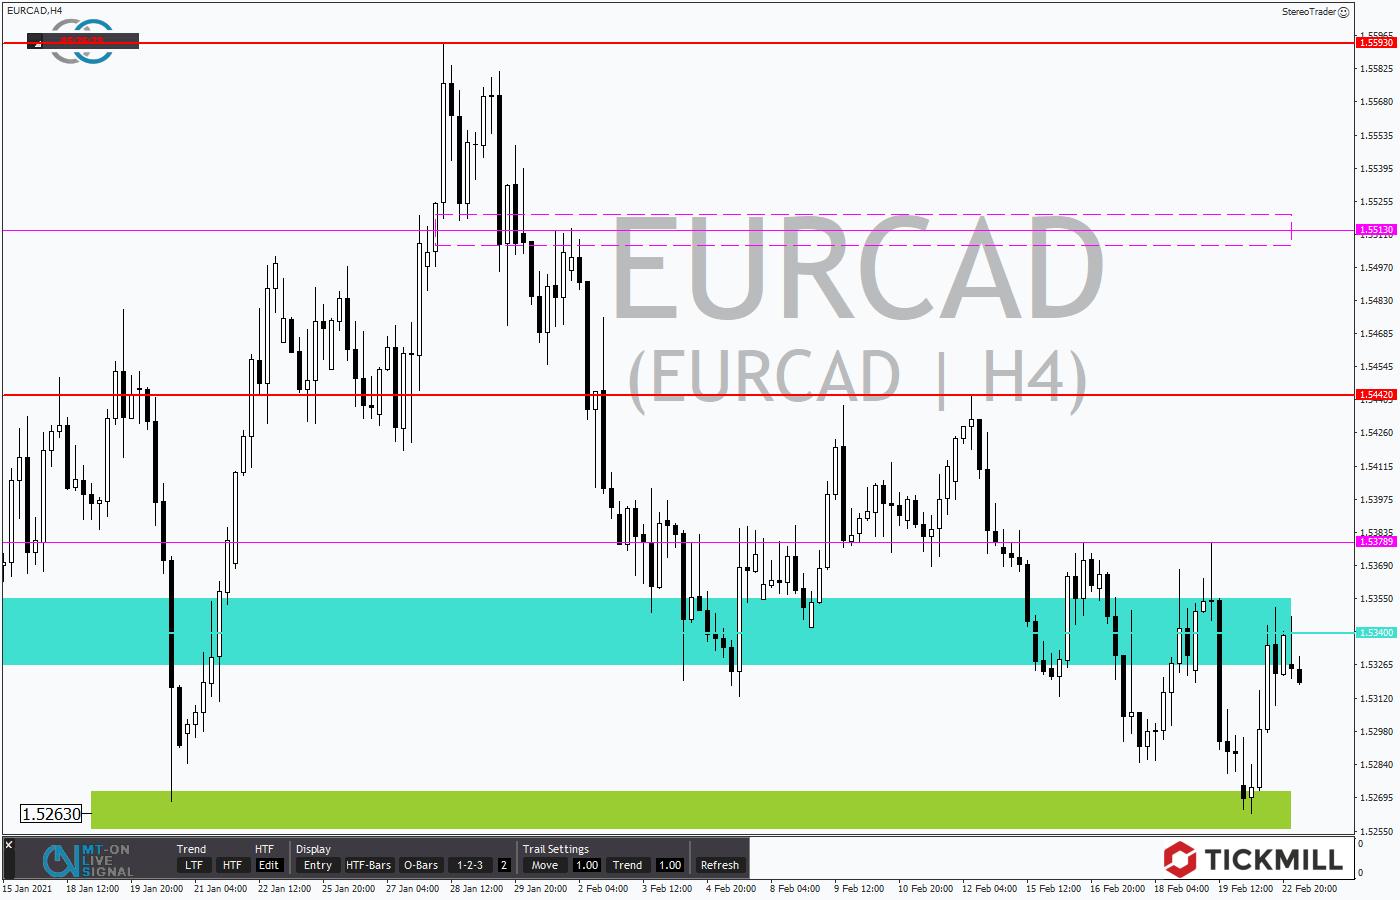 Tickmill-Analyse: EURCAD im 4-Stundenchart